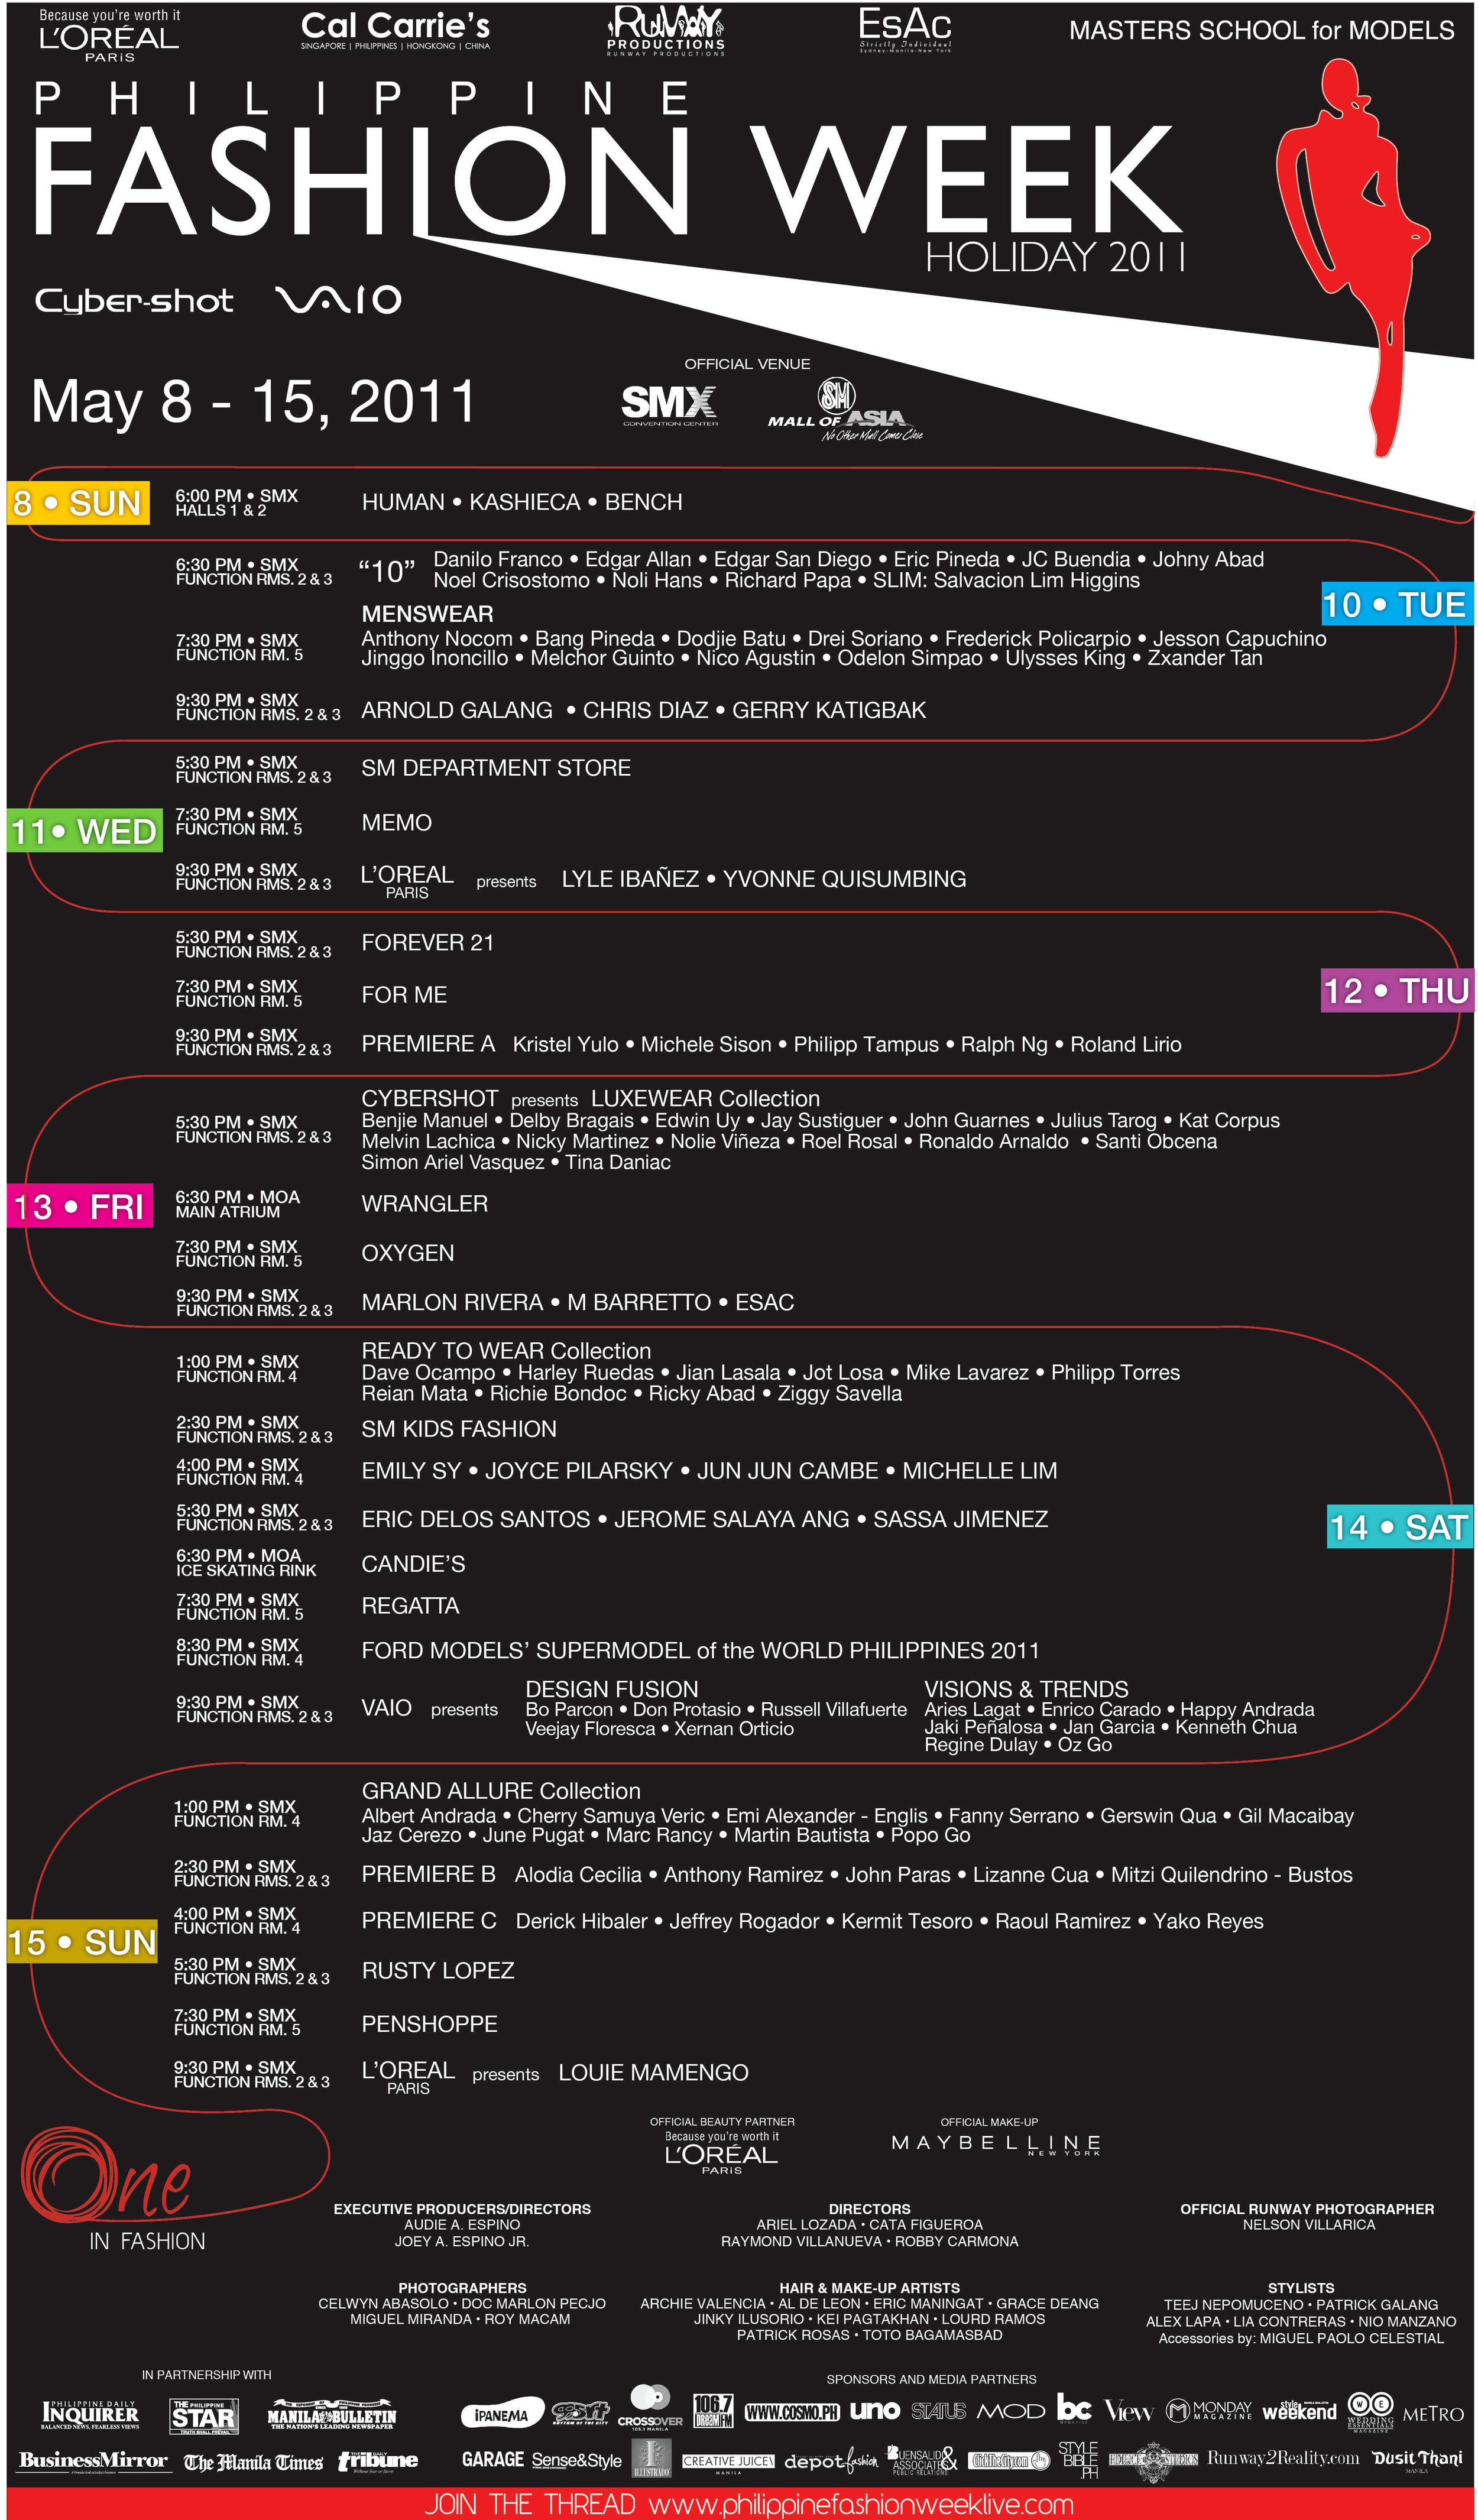 PhFW Holiday 2011 Show Schedule.jpg